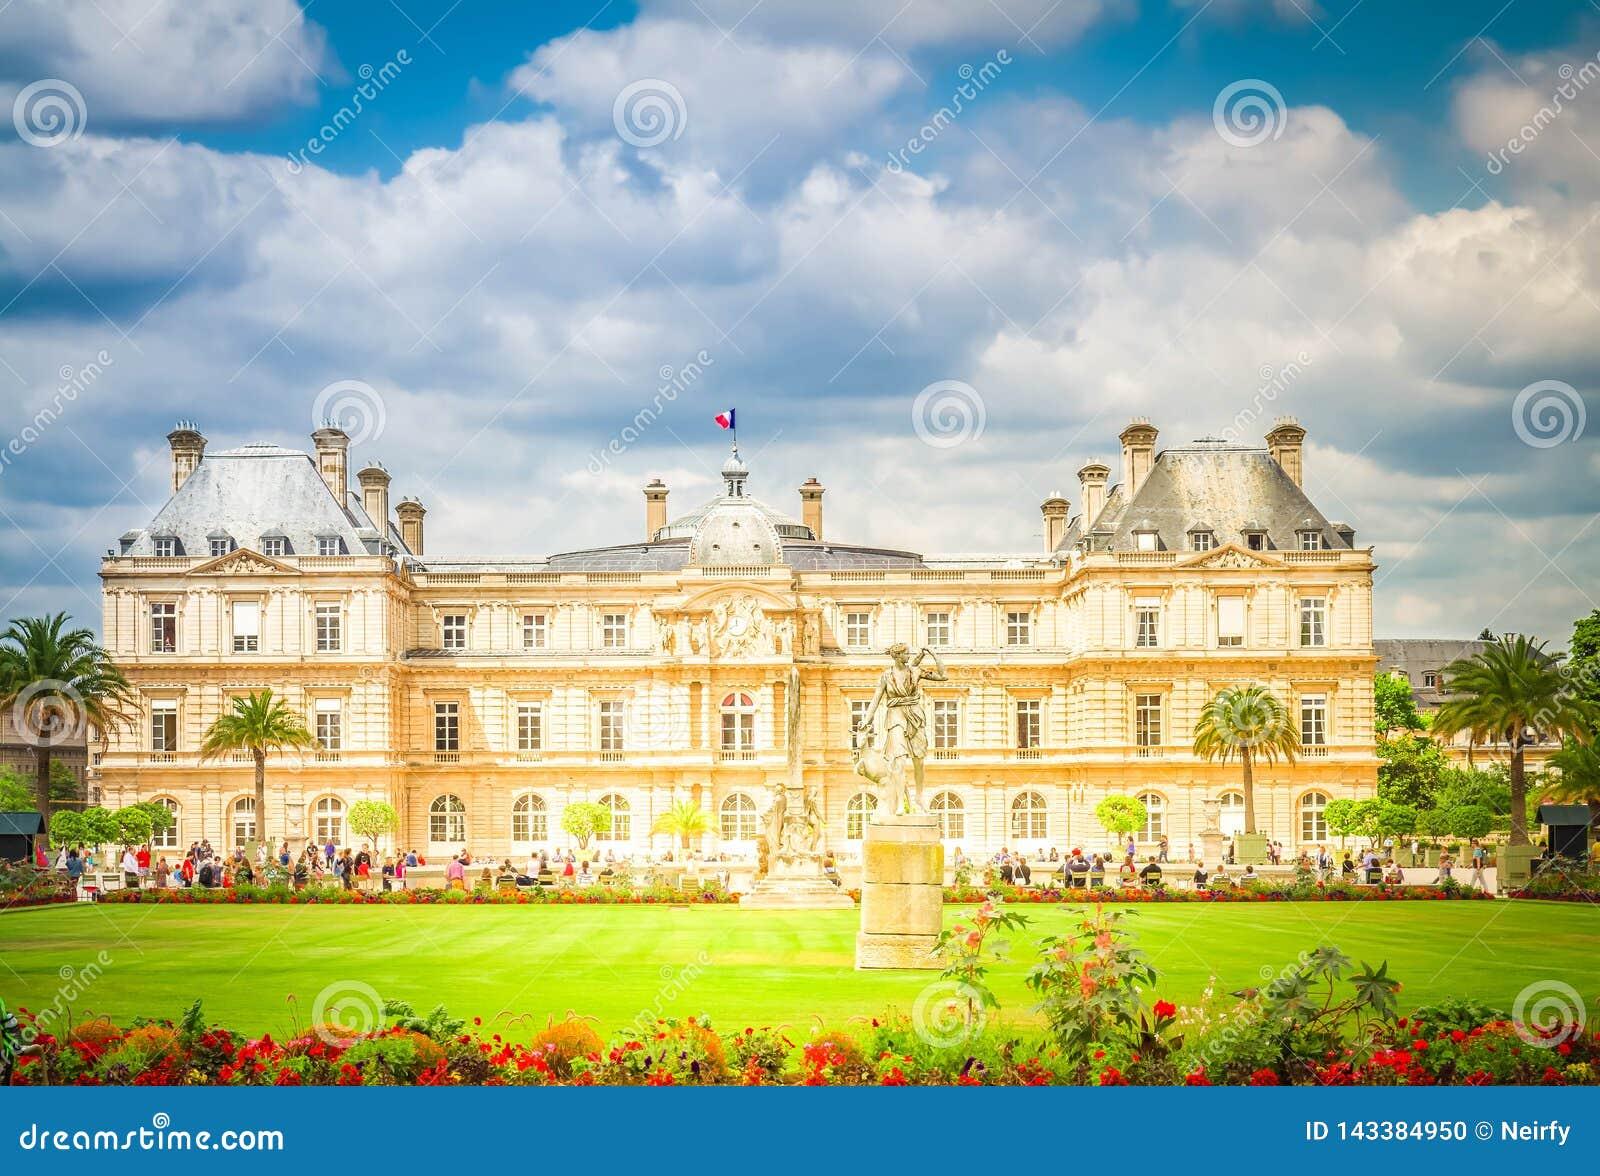 Dag trädgårds- luxembourg paris september